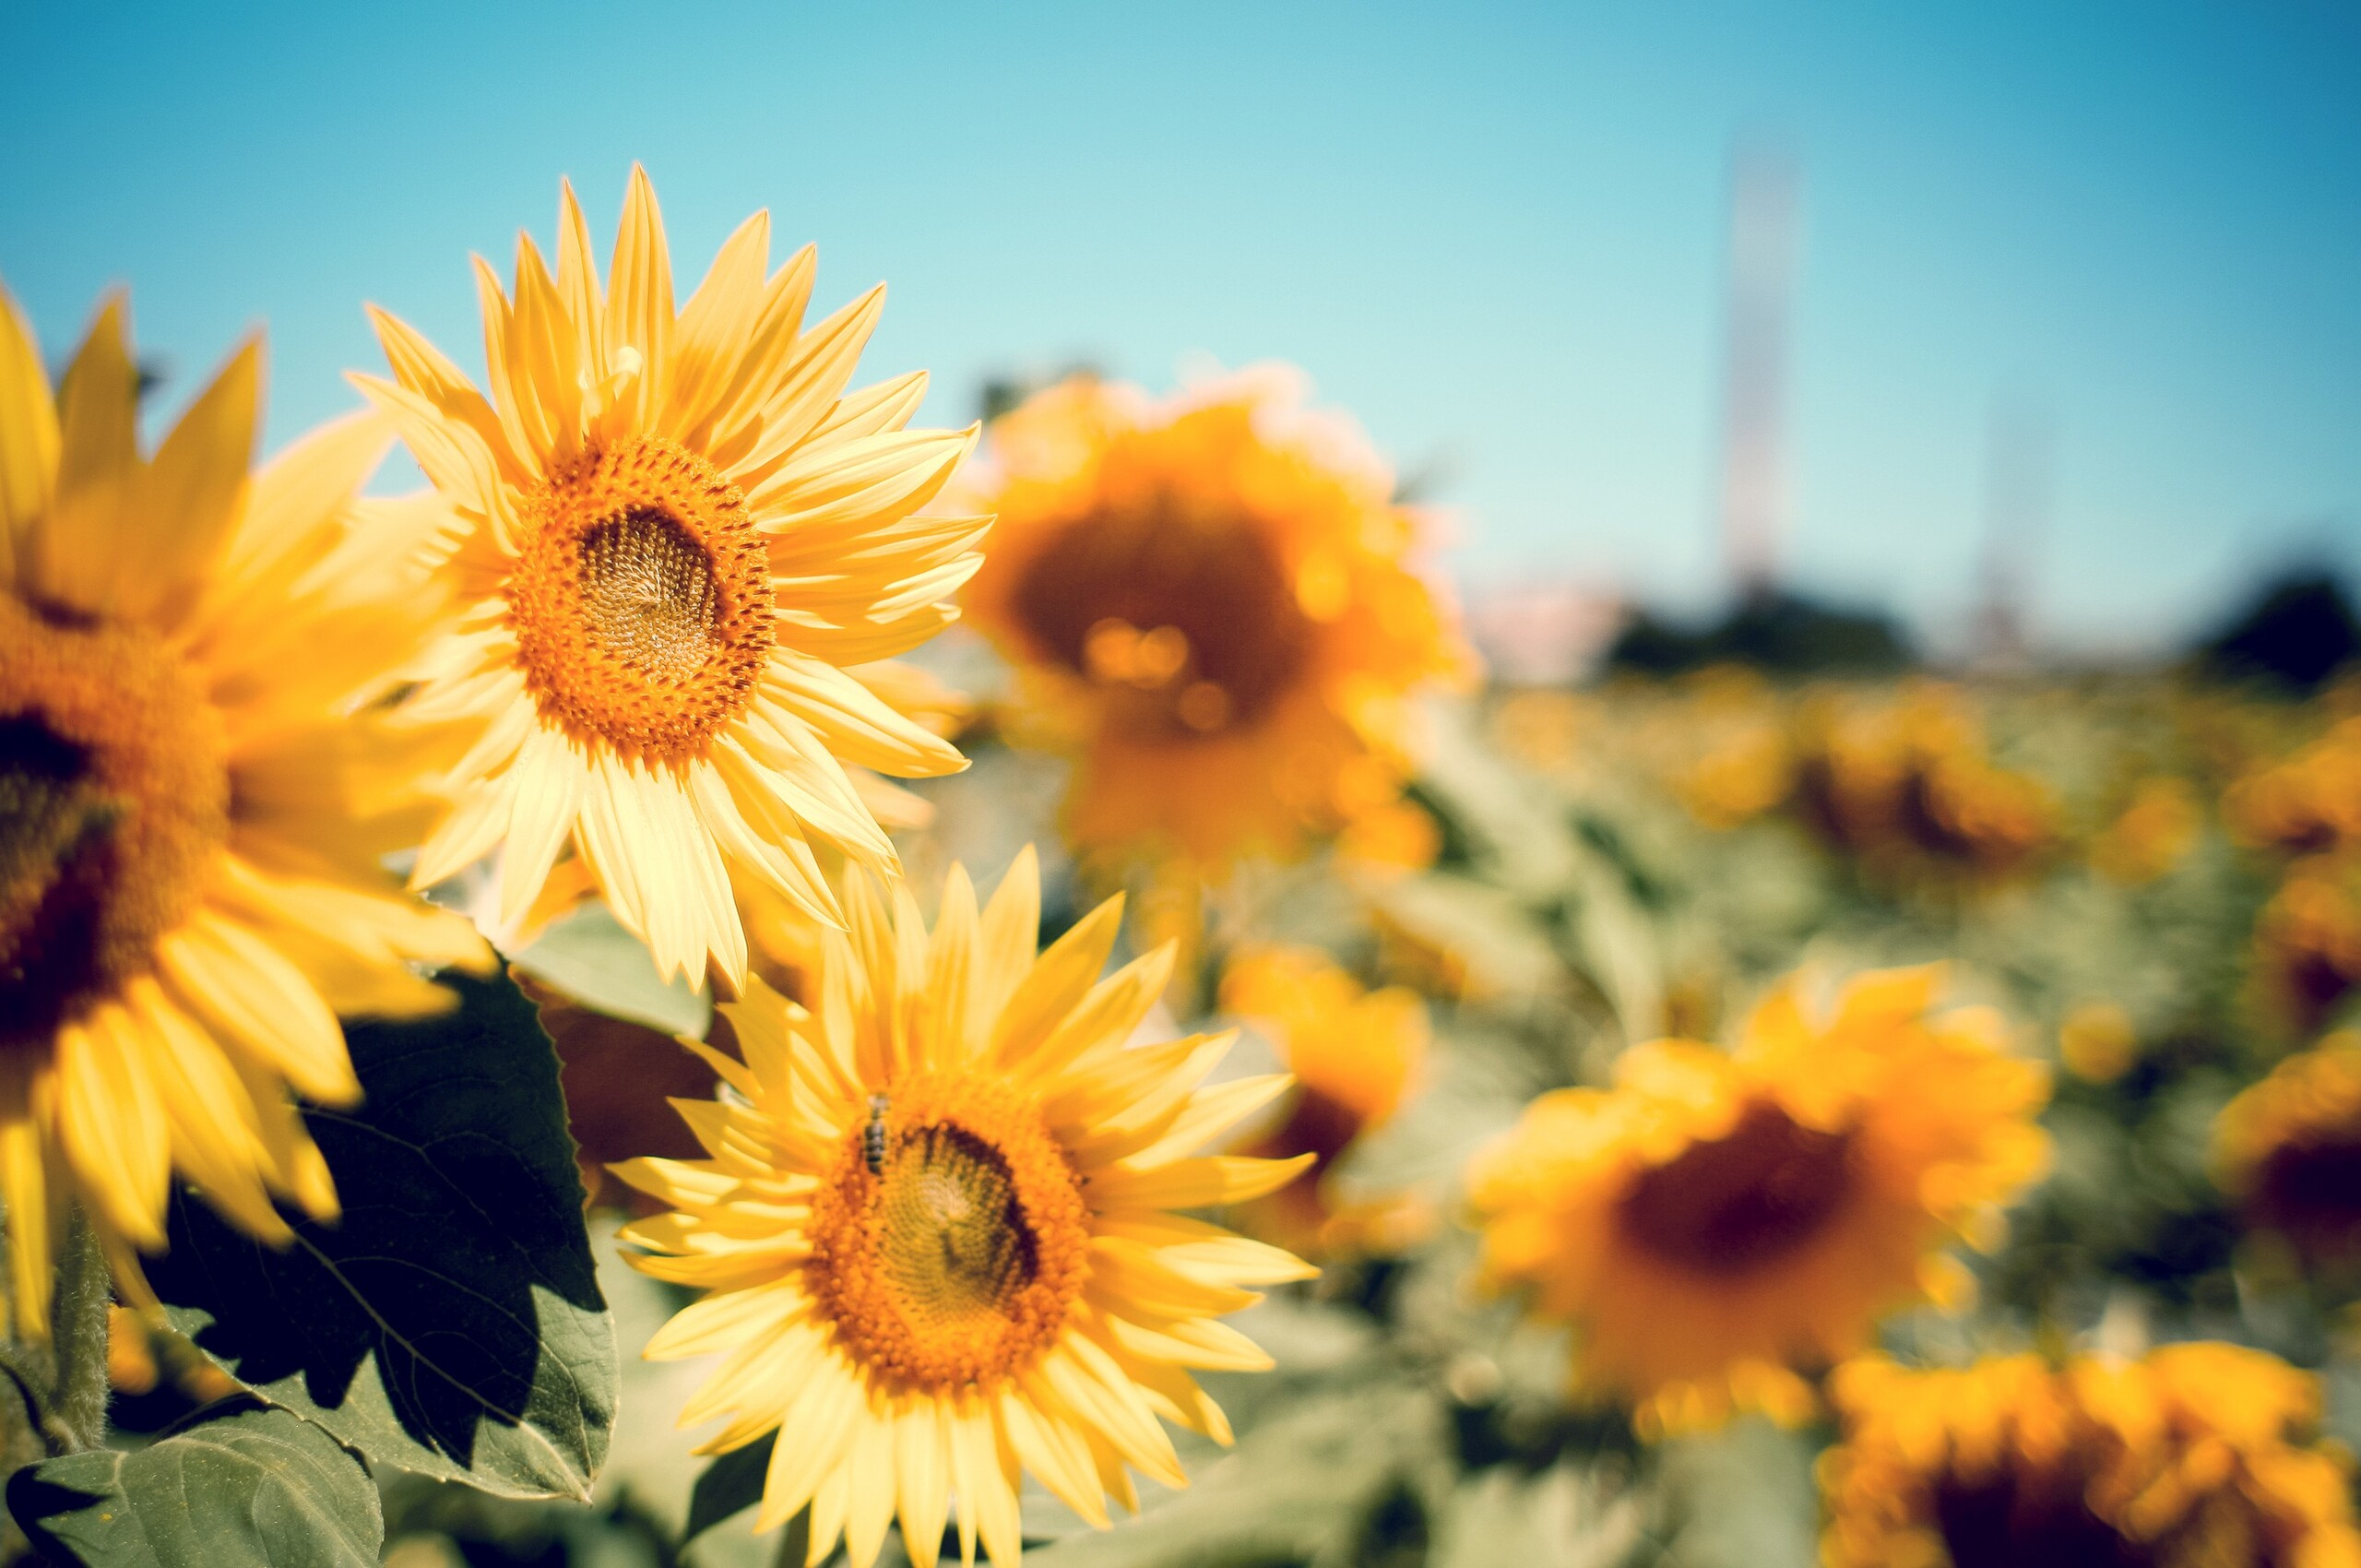 Sunflower Wallpaper Chromebook 3d Android Wallpaper